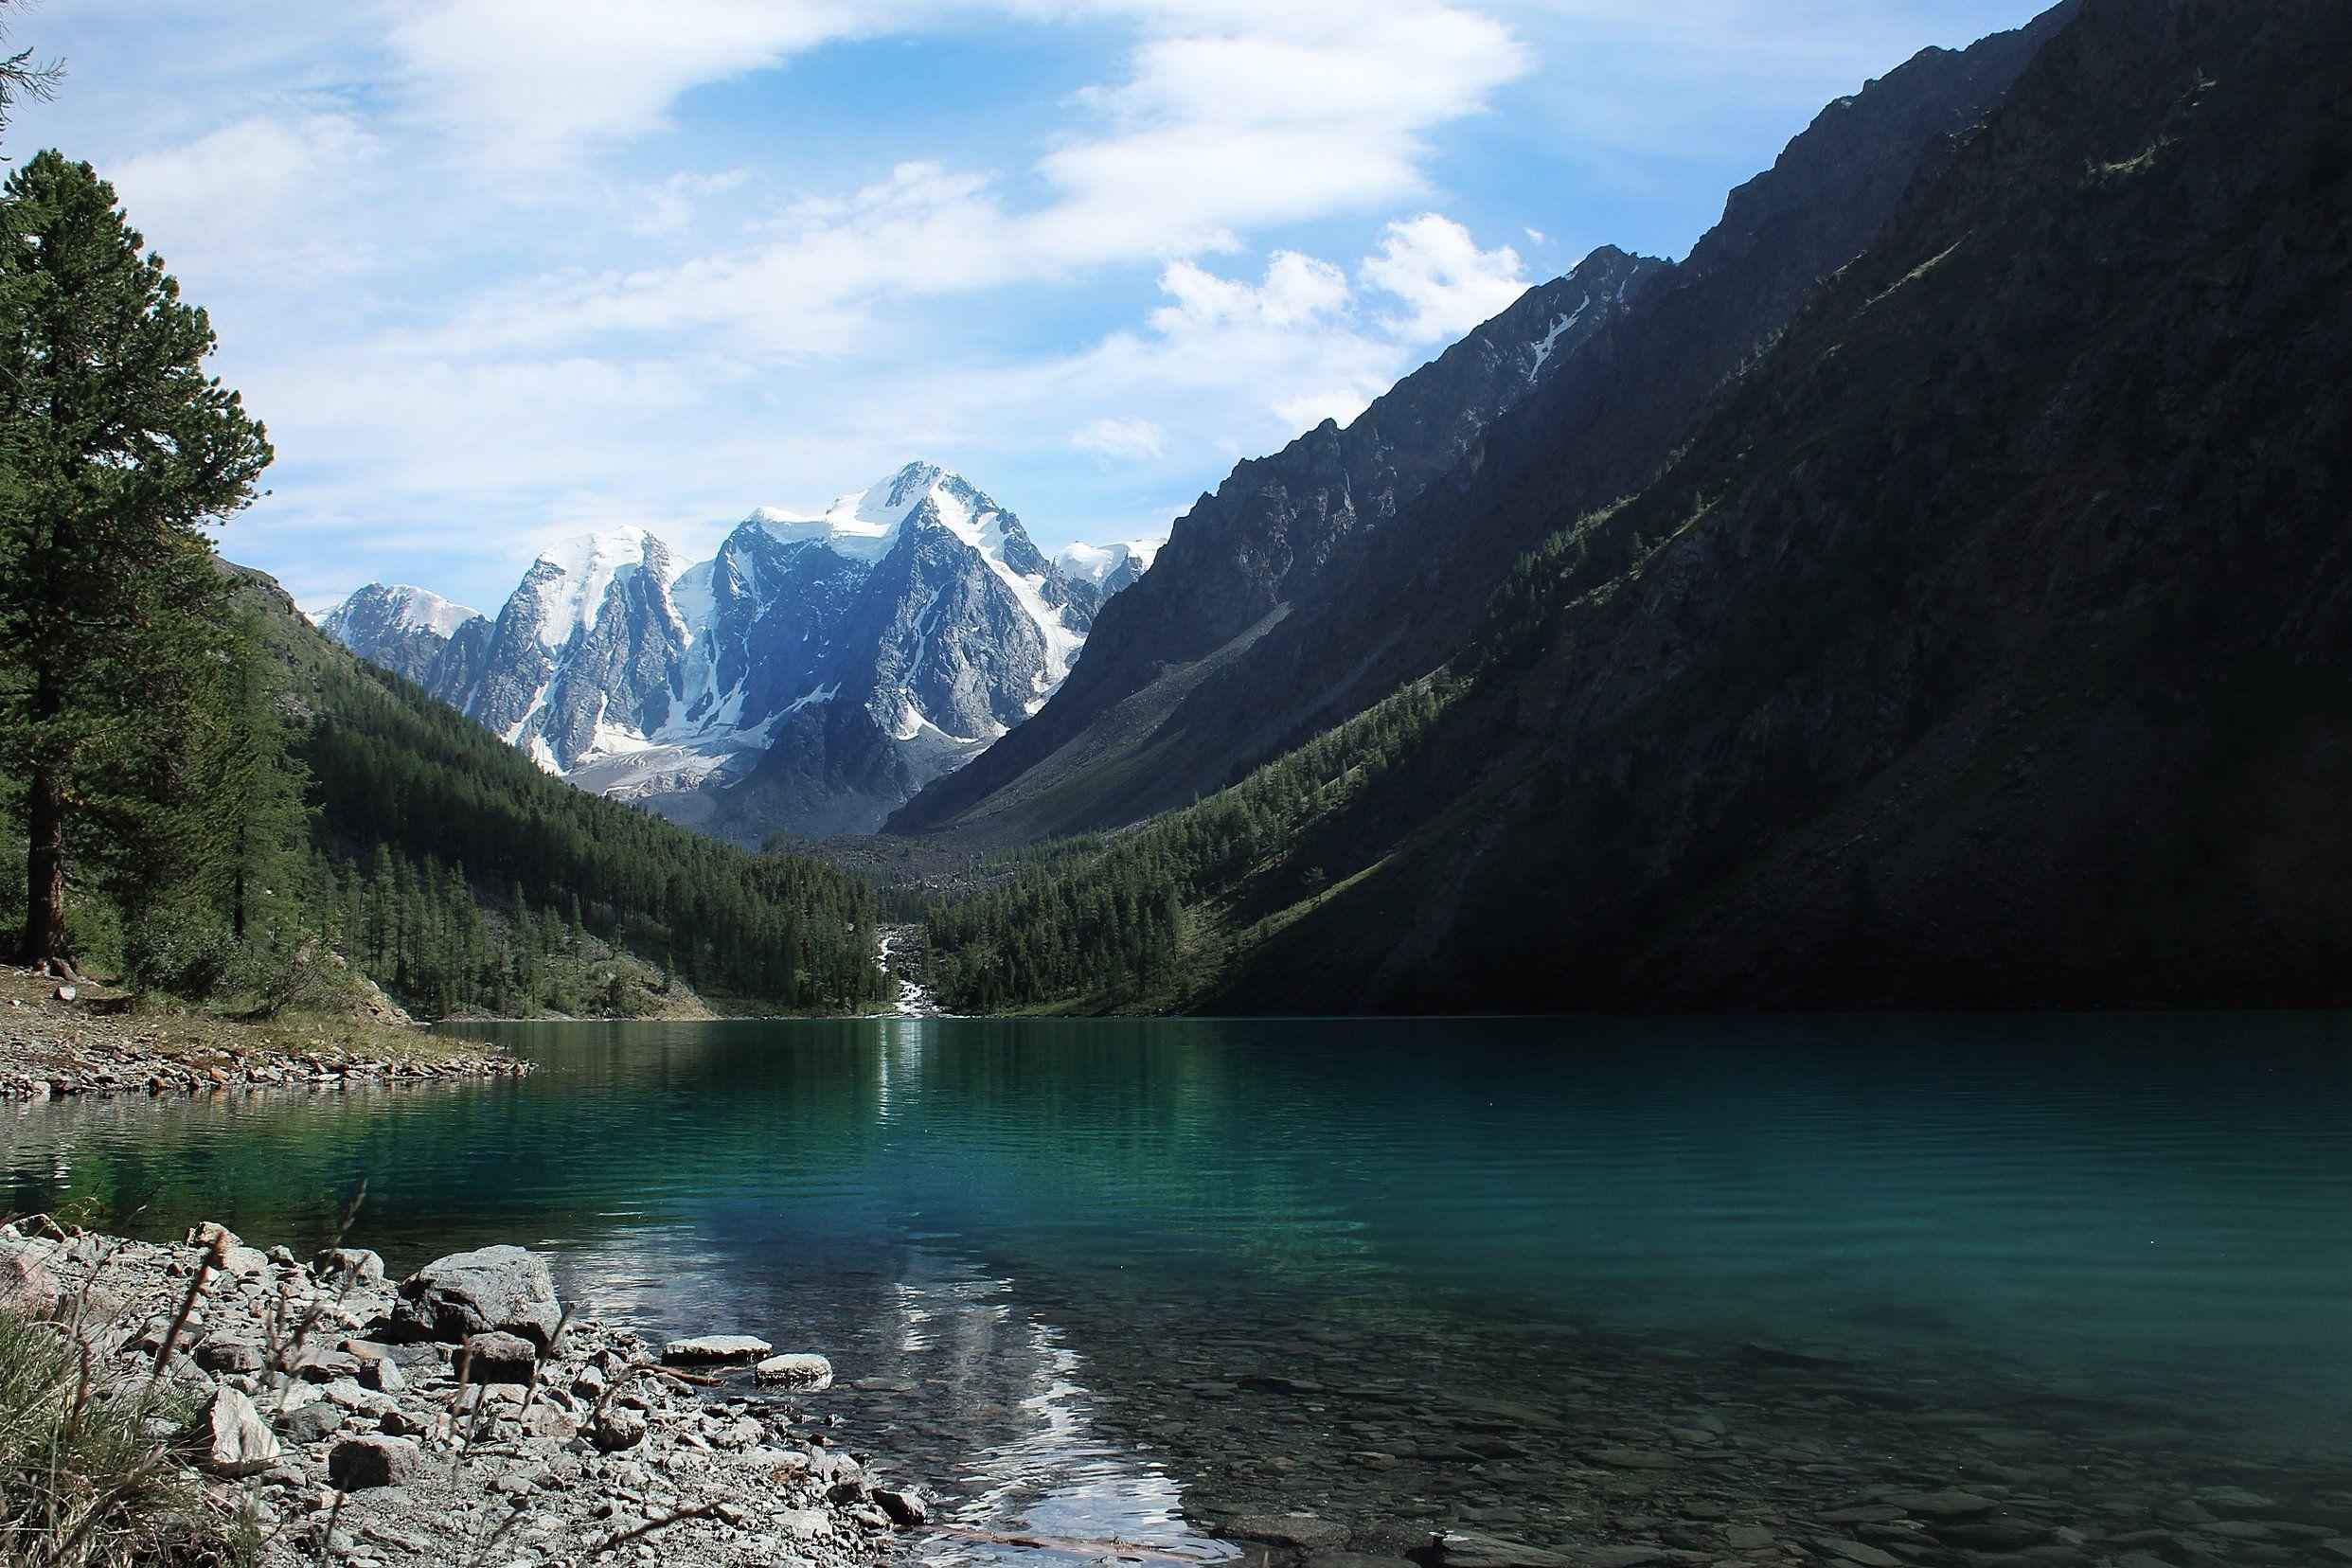 природа, алтай, горы, лес, солнце, озеро, nature, mountains, forest, light, lake, Станислав Попов